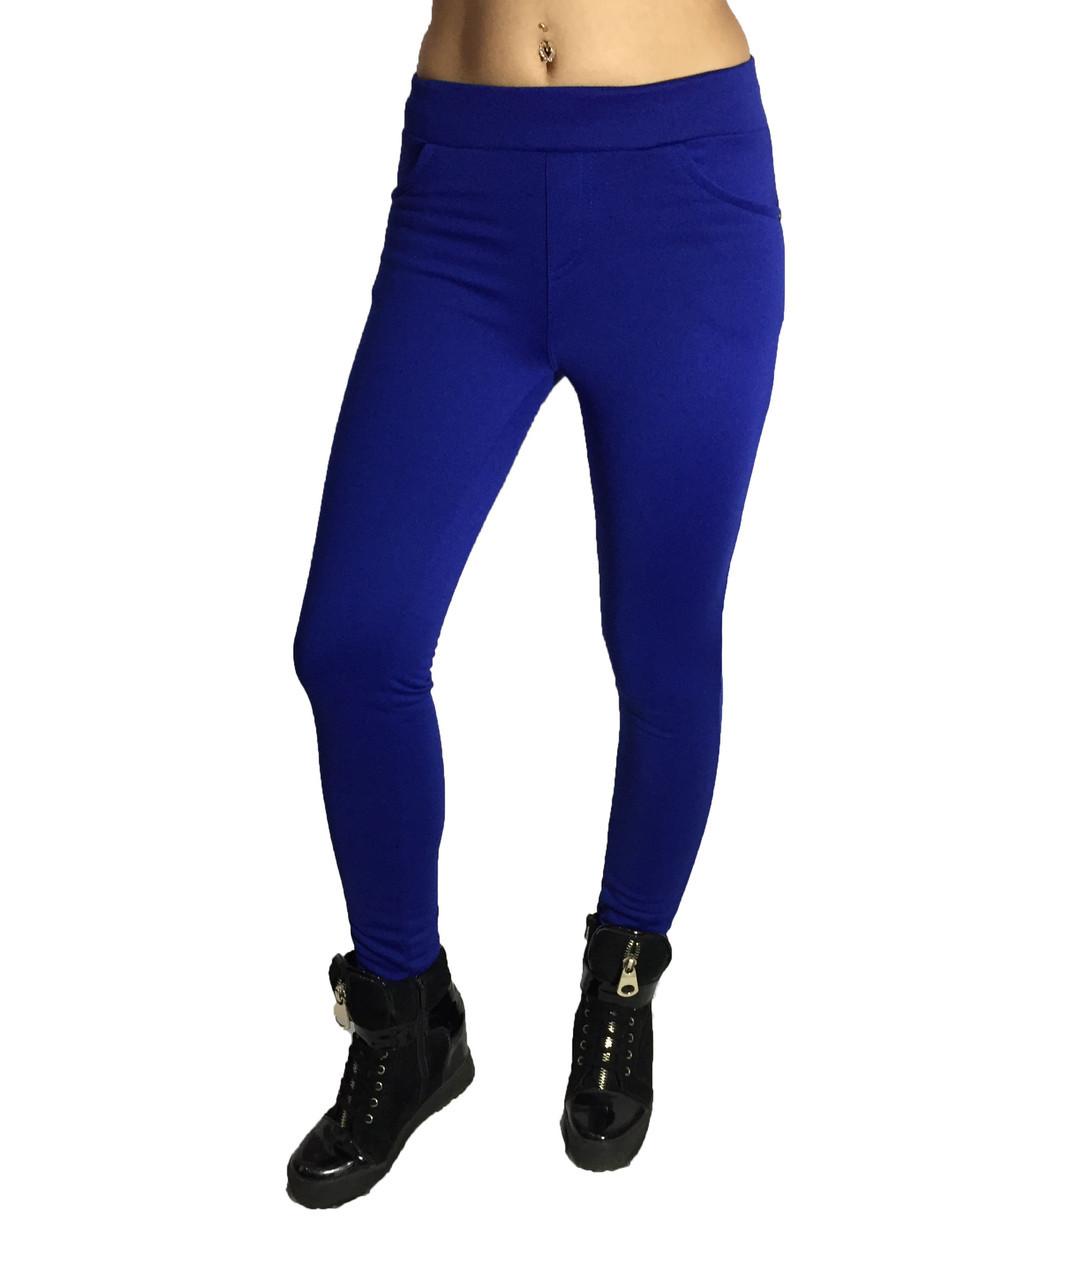 Женские брюки № 151 дайвиг-начес синие НОРМА